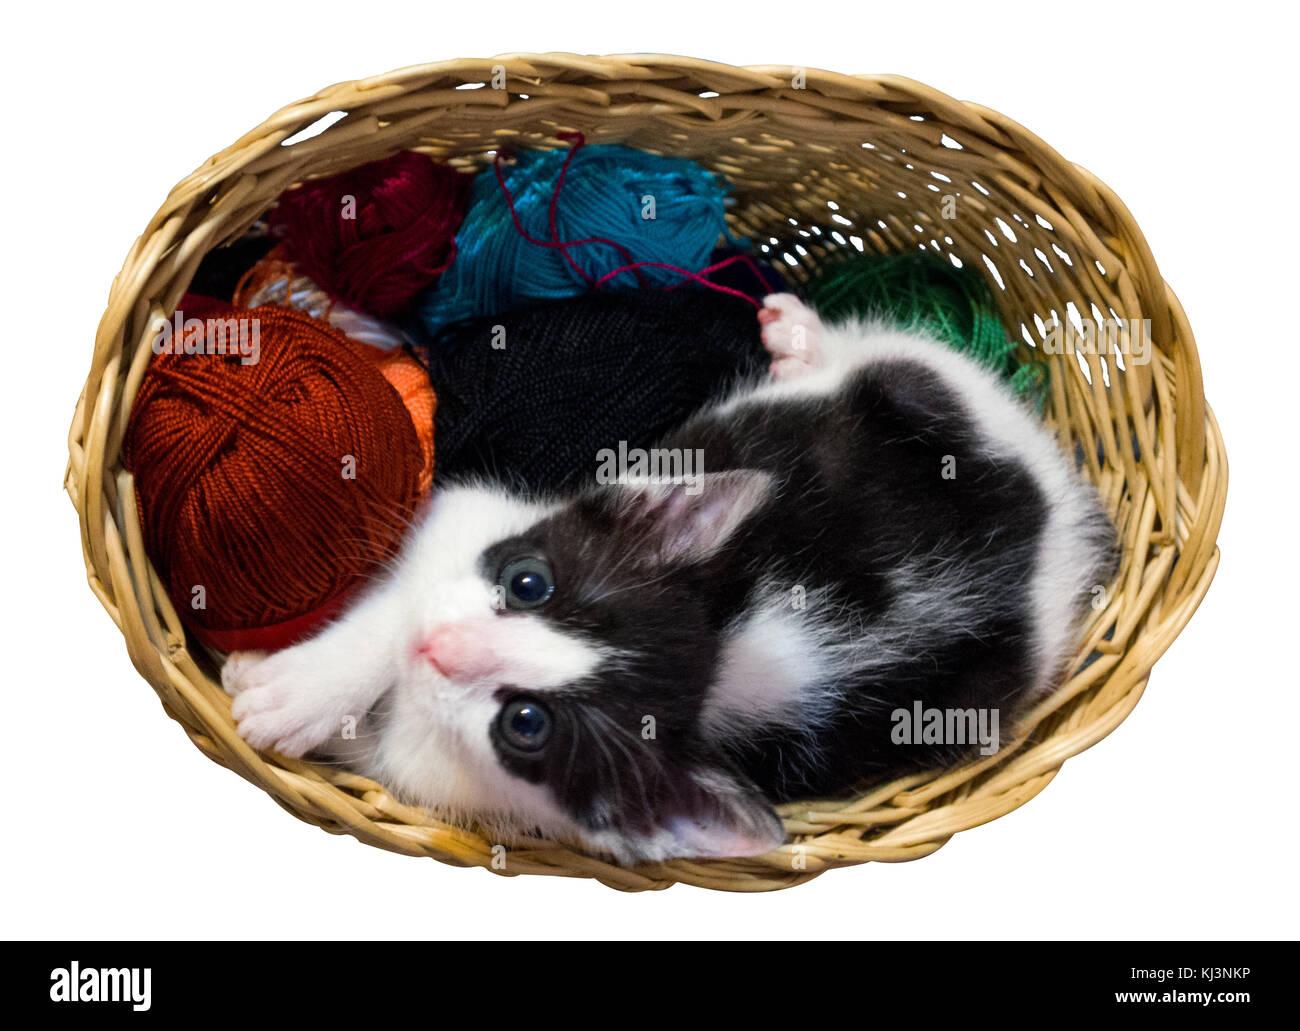 Kitten In Wicker Basket White Background Stock Photo